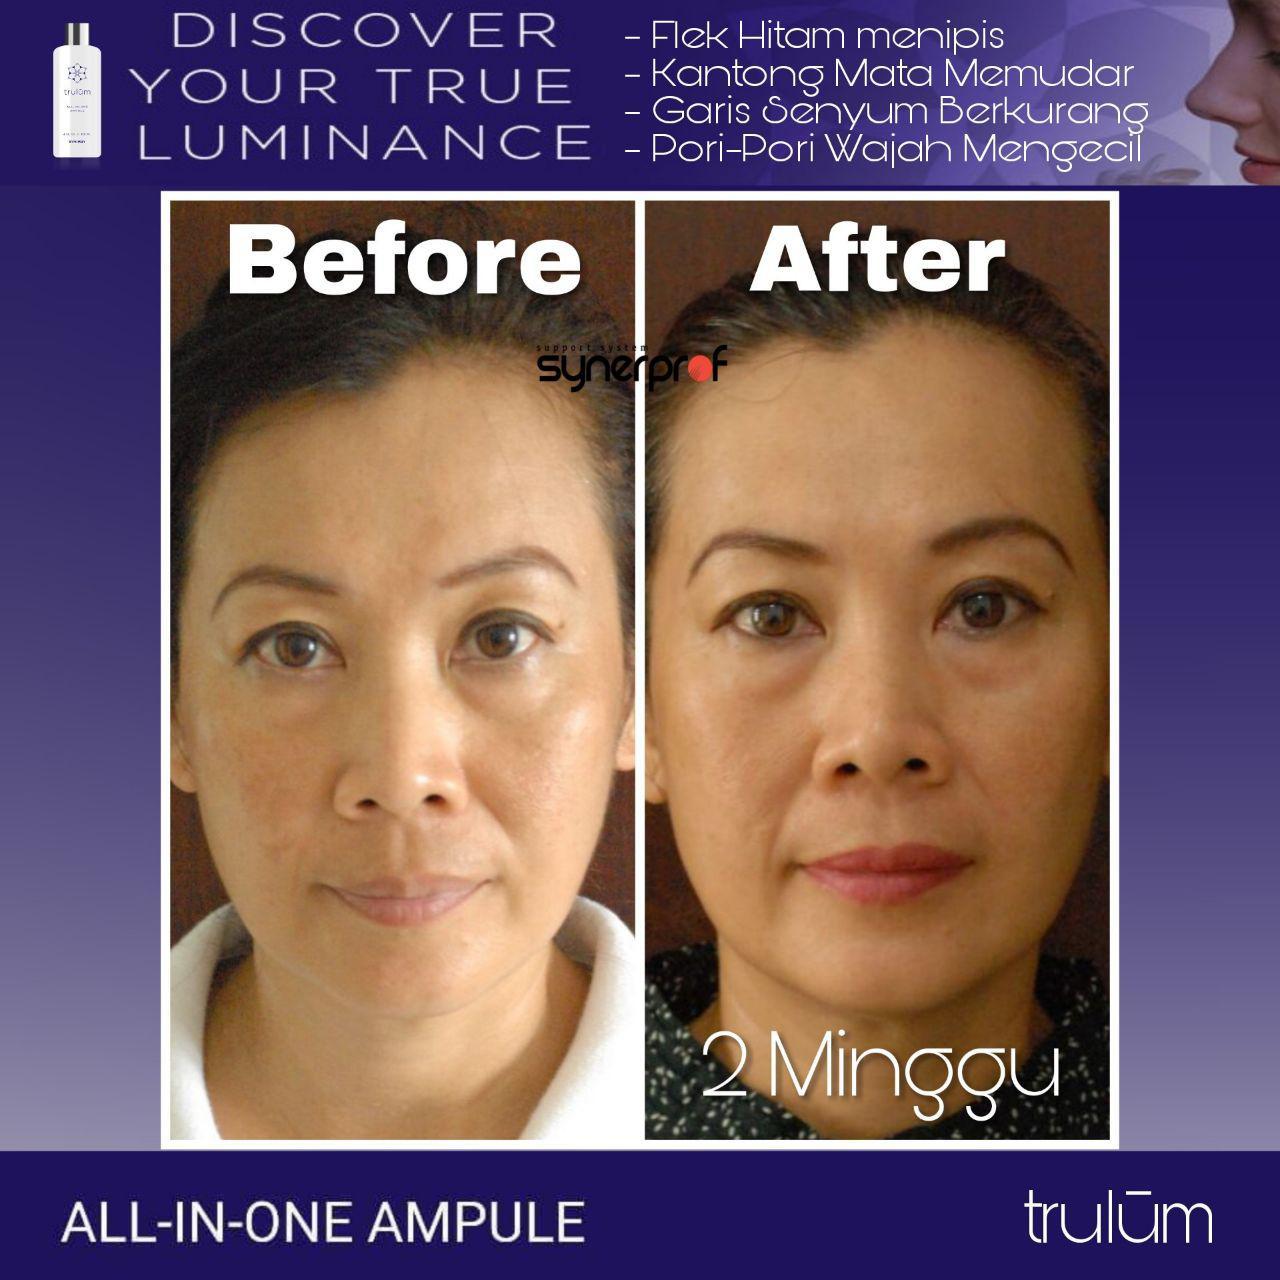 Tempat FacialKulit Sensitif di Tiang Pumpung Kepungut, Musi Rawas WA: 08112338376